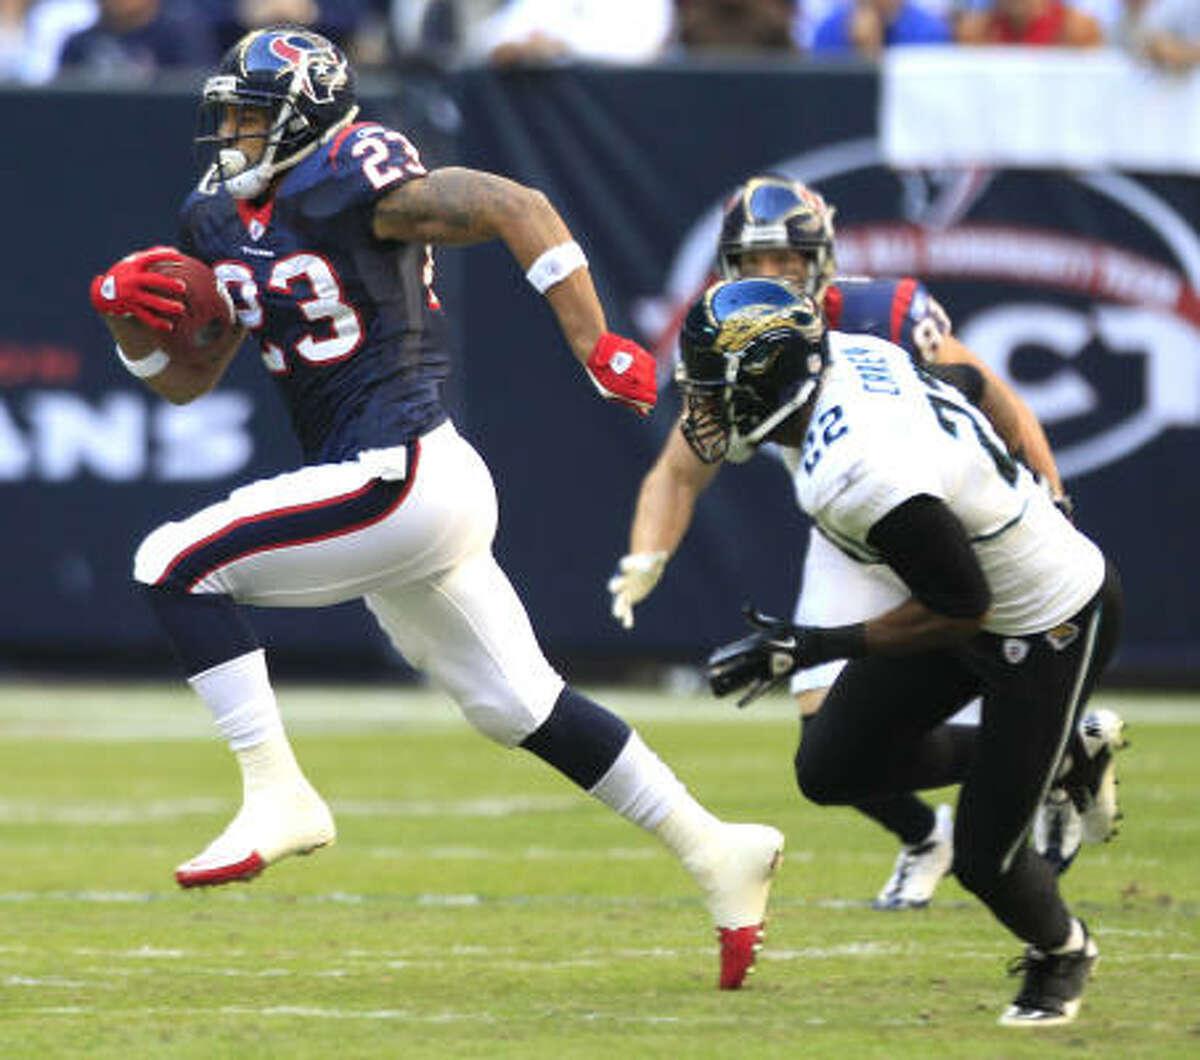 Jan. 2: Texans 34, Jaguars 17 Texans running back Arian Foster (23) runs past Jaguars cornerback Don Carey on a 56-yard run during the first quarter.